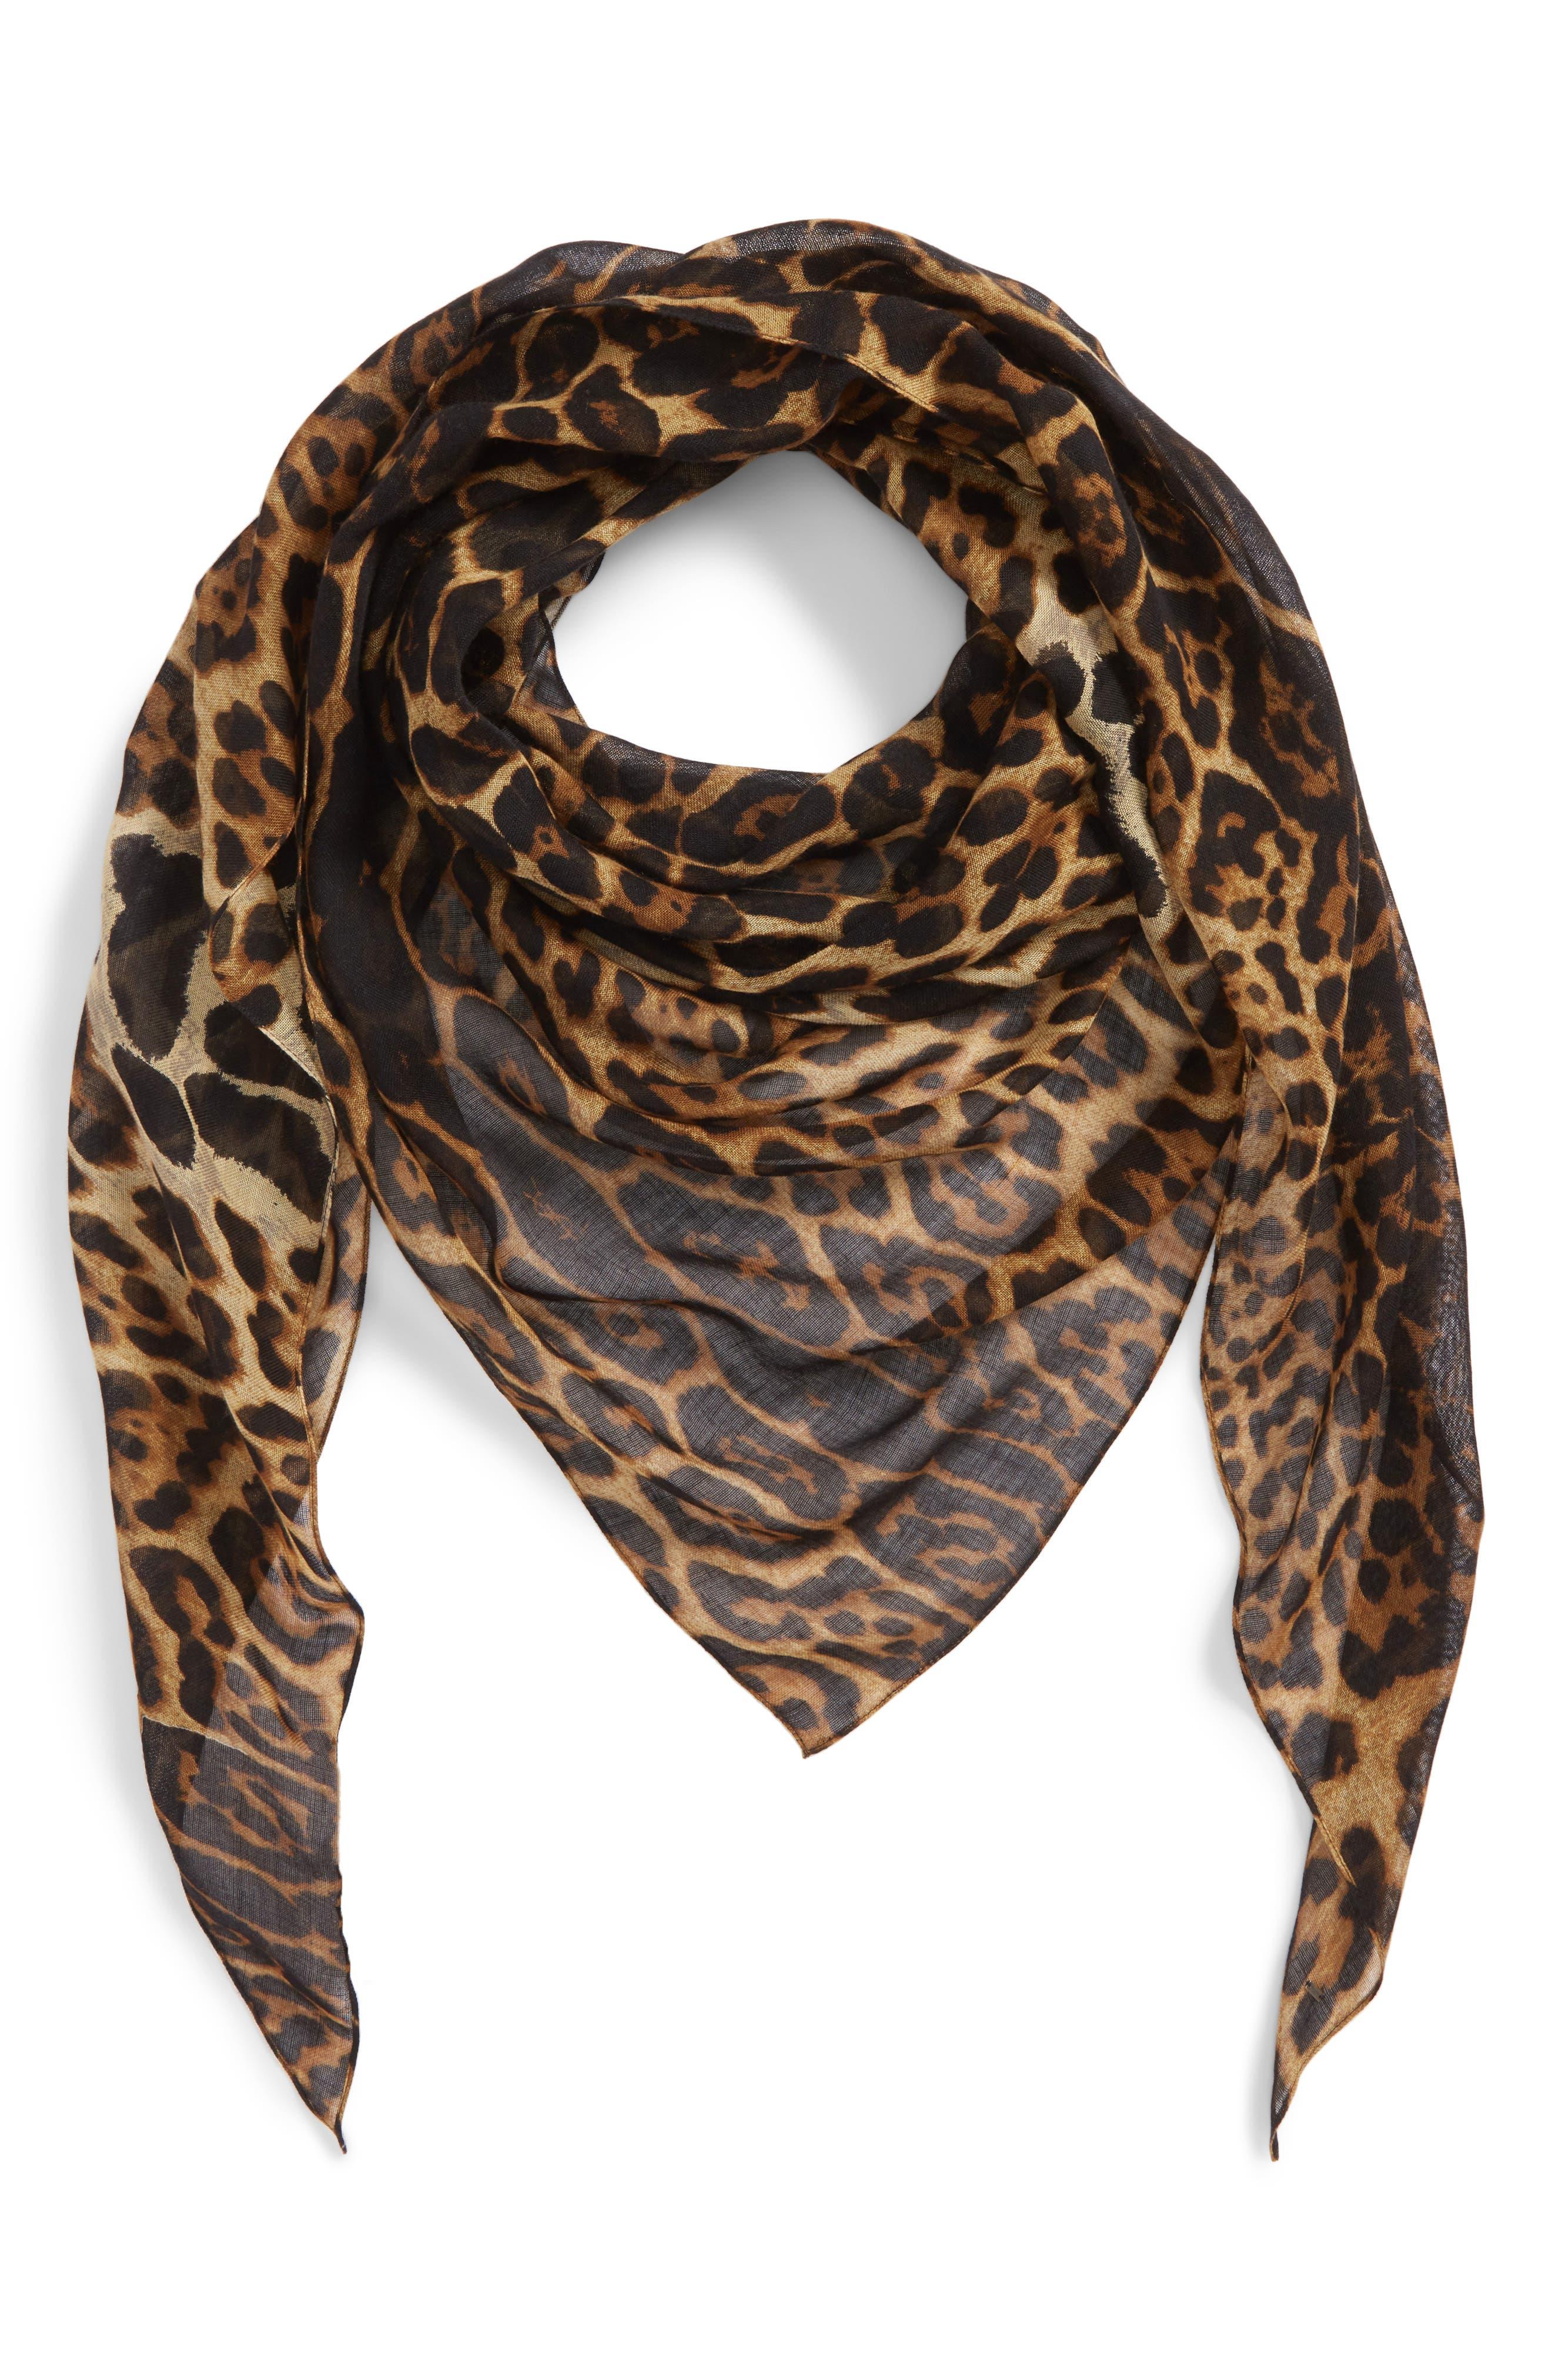 YSL Leopard Print Cashmere & Silk Triangle Scarf,                             Alternate thumbnail 2, color,                             Mahogany/ Black